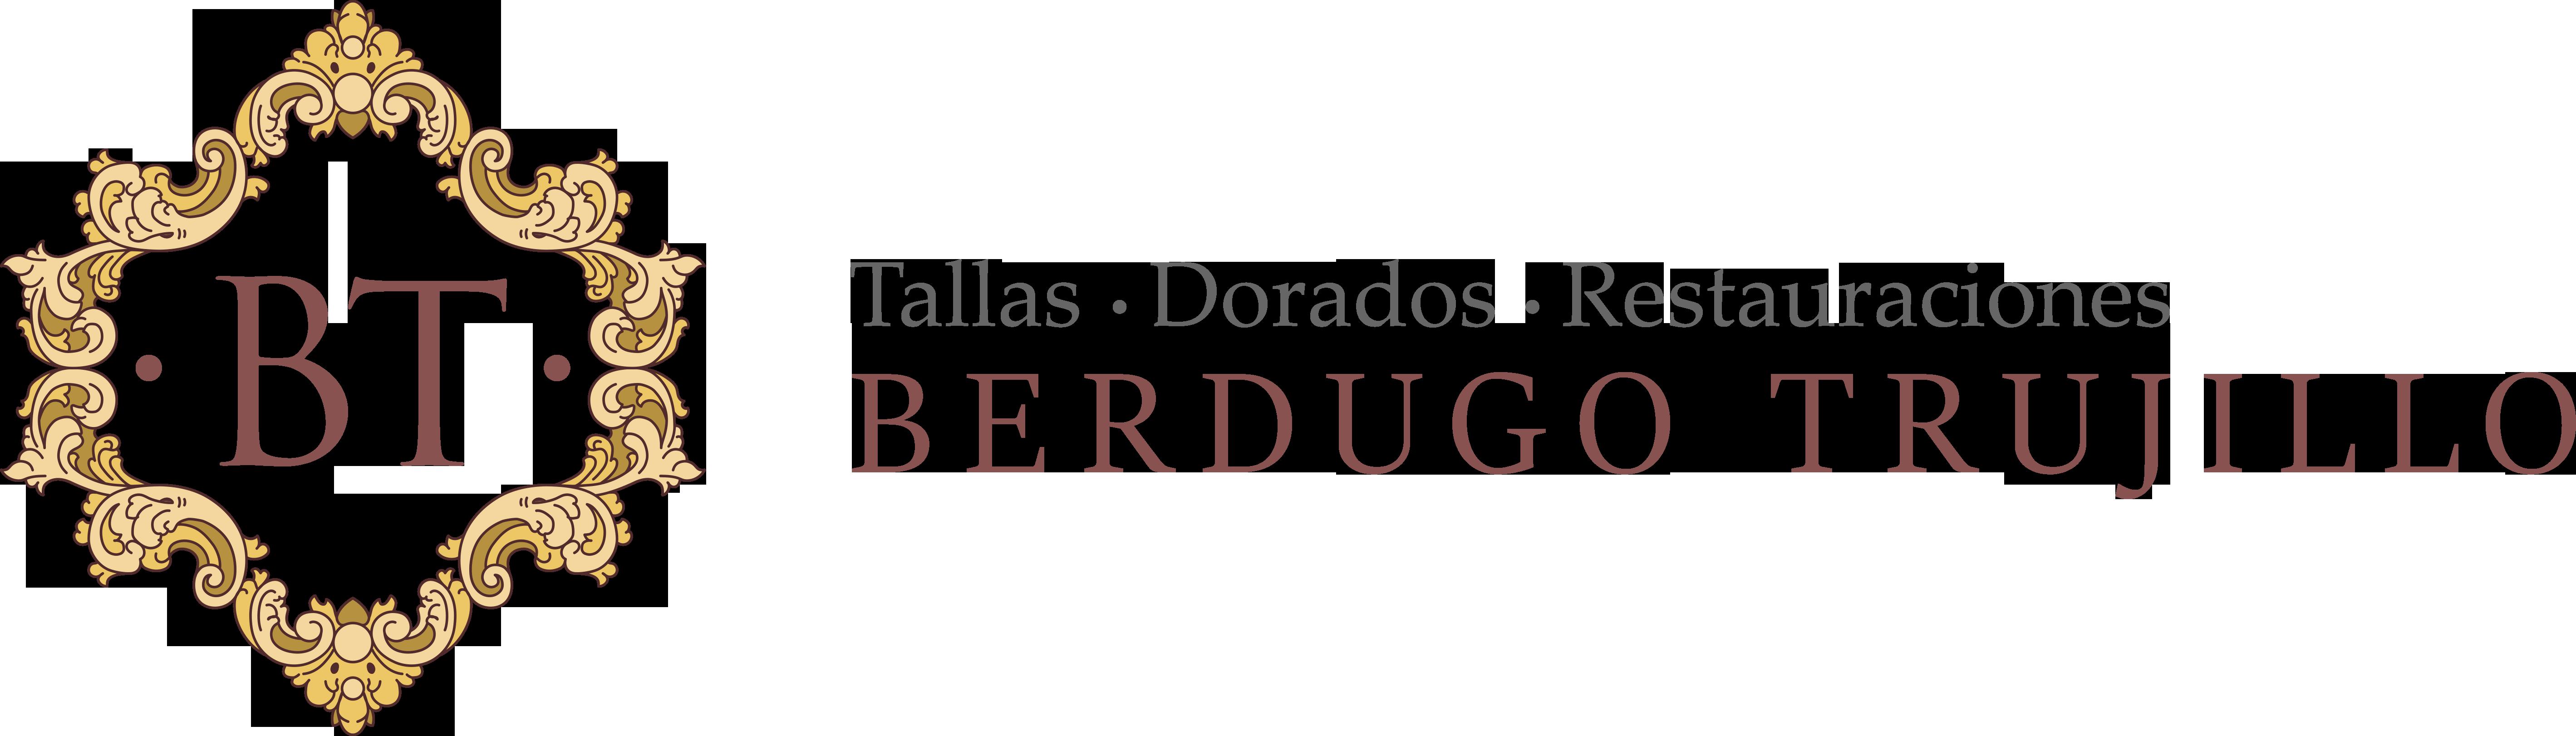 Logotipo Berdugo Trujillo-1